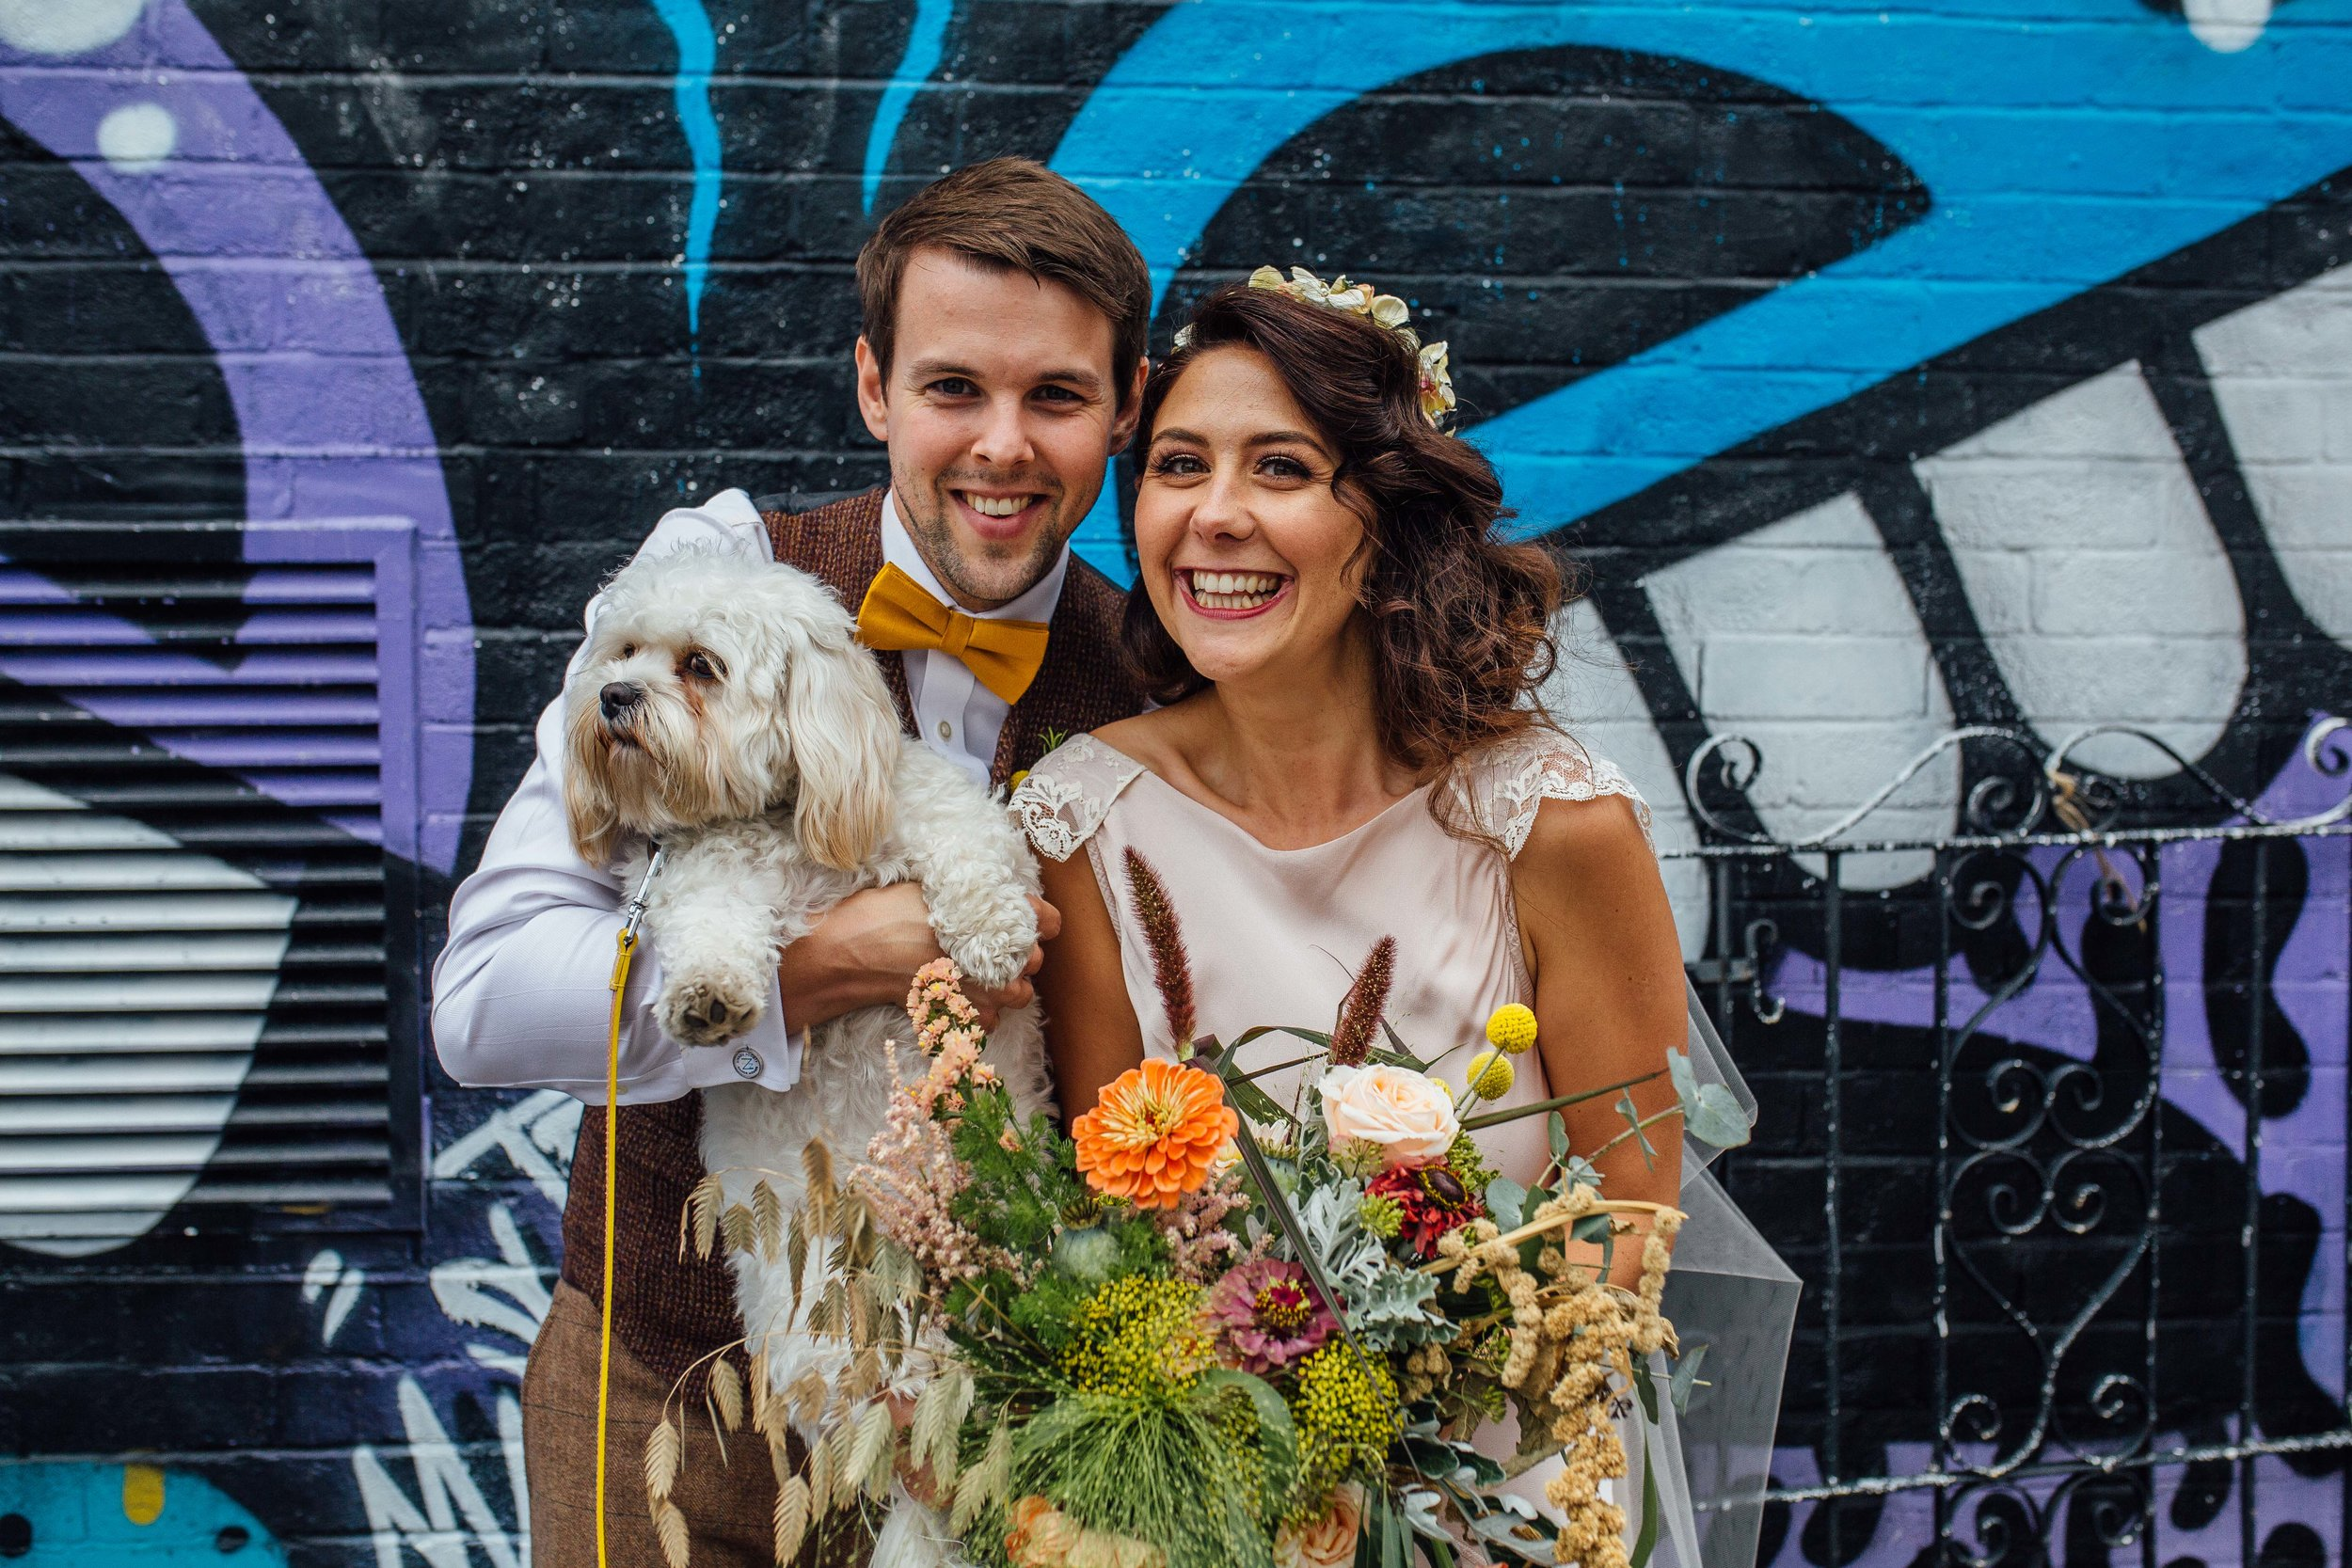 Katy-Bespoke-Veil-Sheffield-Wedding-Wes-Anderson-Susanna-Greening-Derbyshire-21